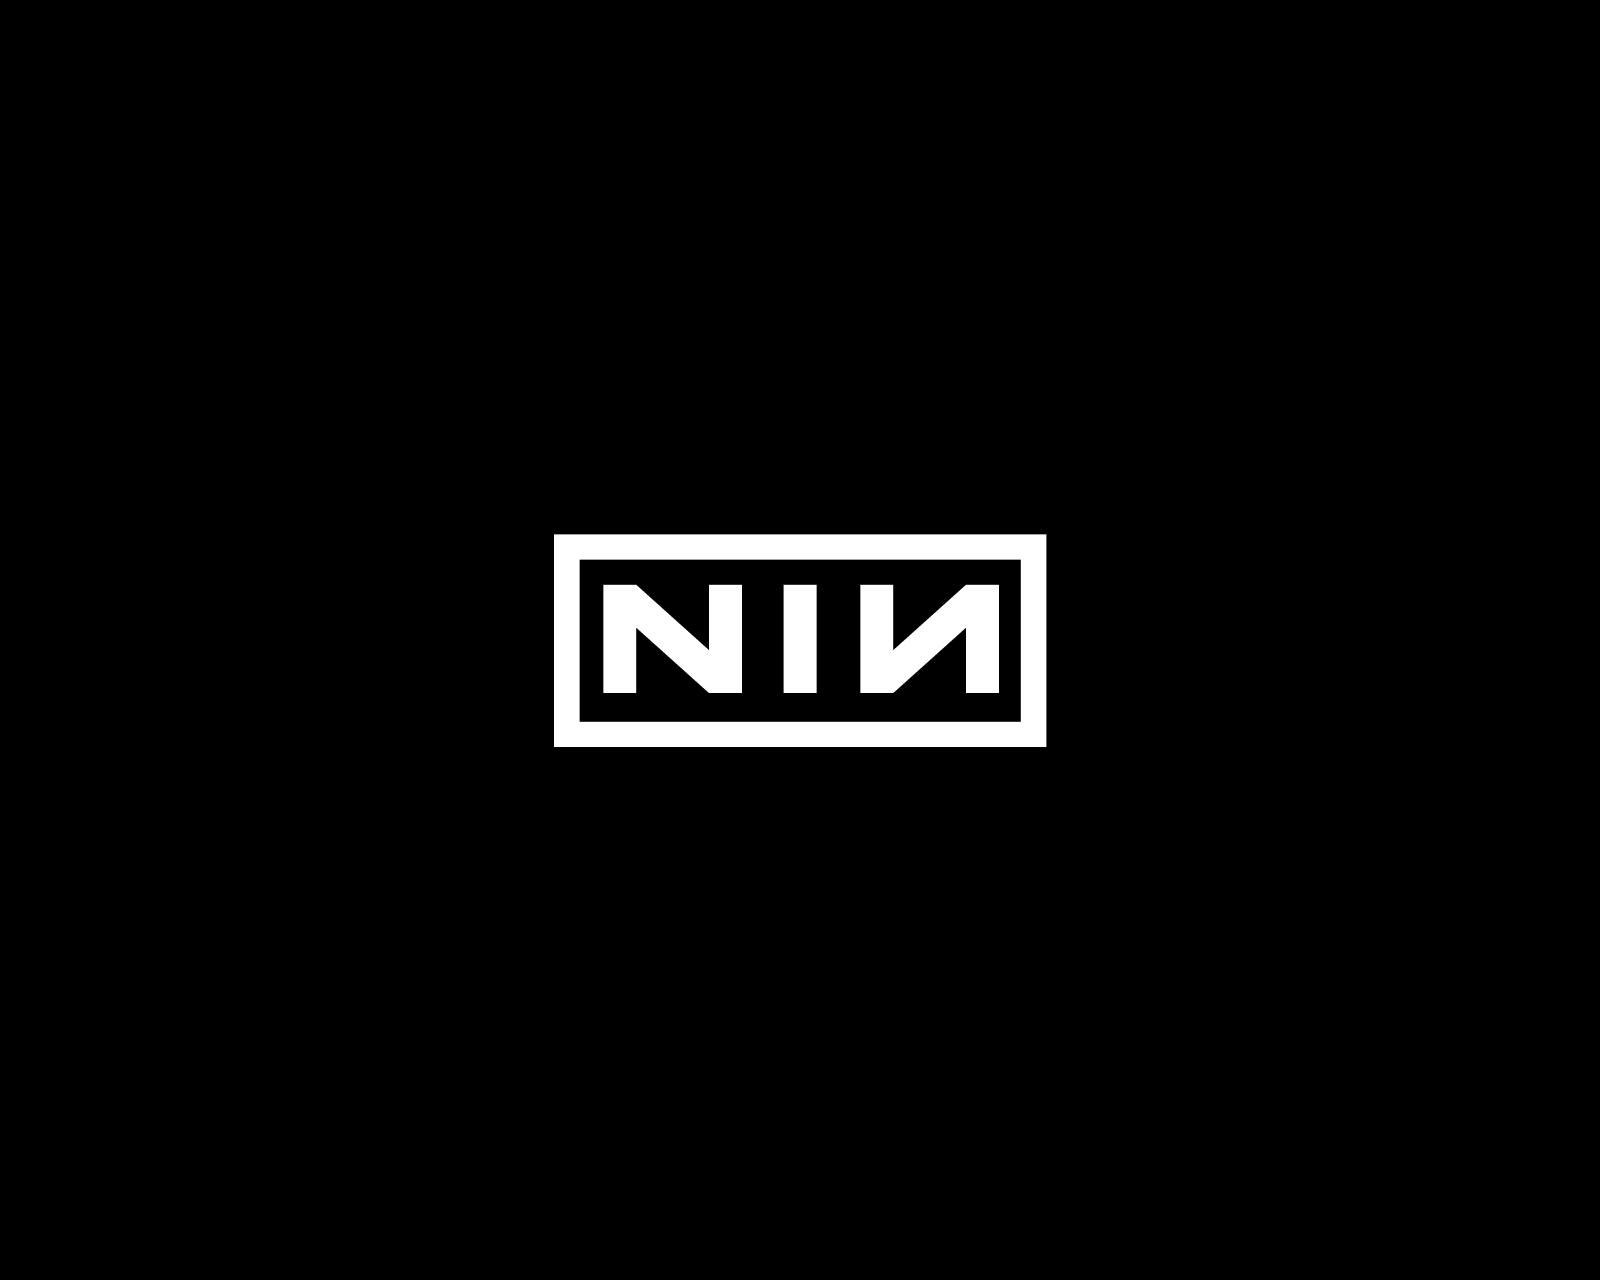 Nine inch nails Logos